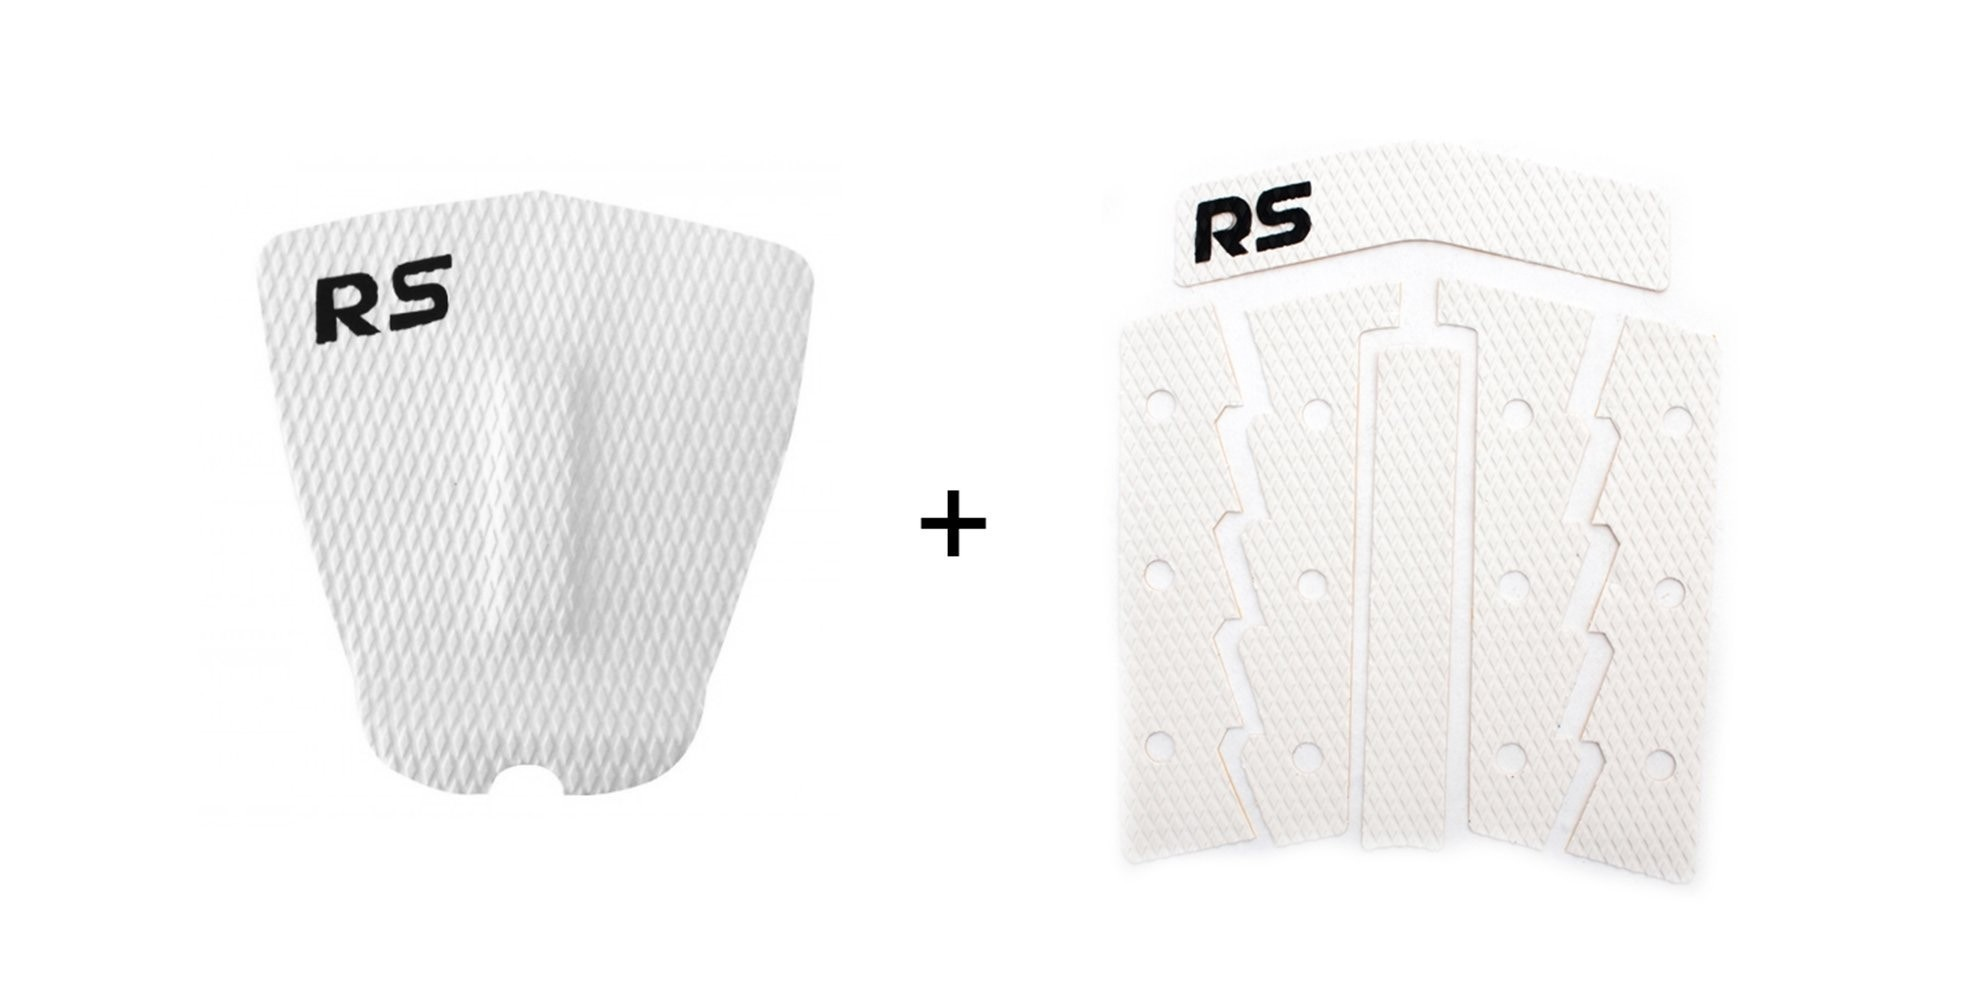 Kit Deck Antiderrapante Frezado Squash RS + Deck Frontal 6 Partes Rubber Sticky Branco | Prancharia